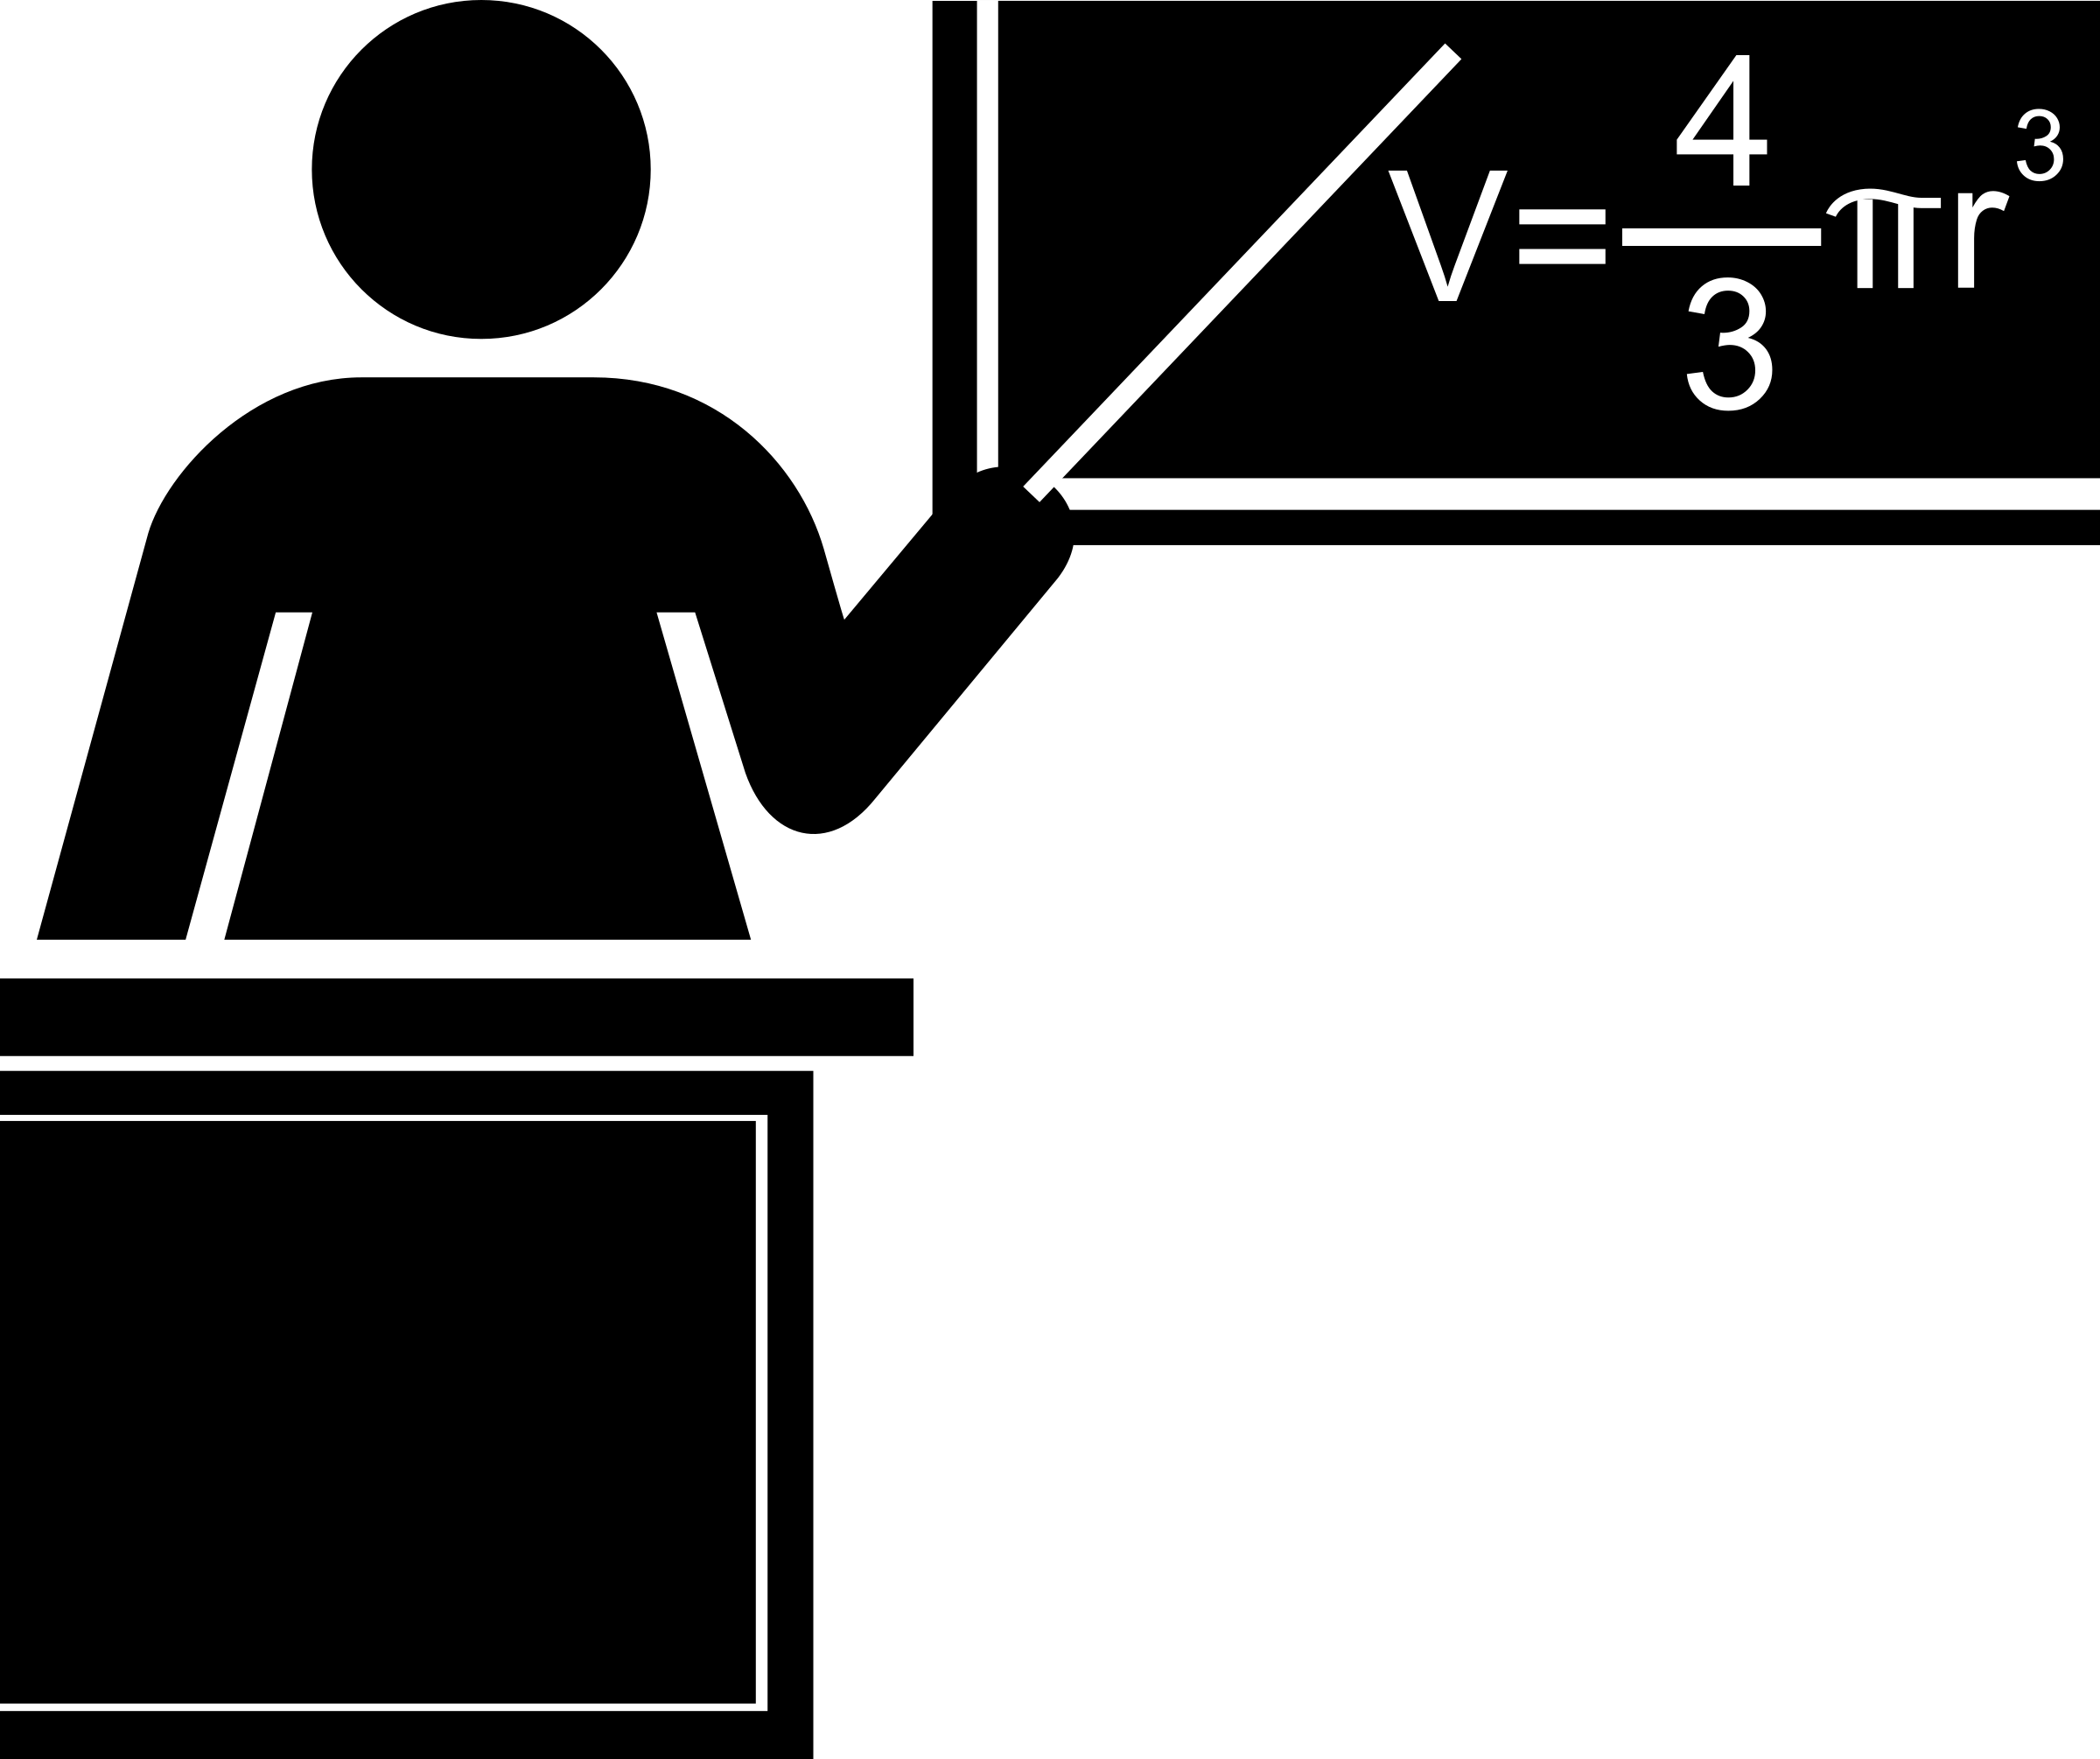 Clipart teacher symbol. Silhouette black and white